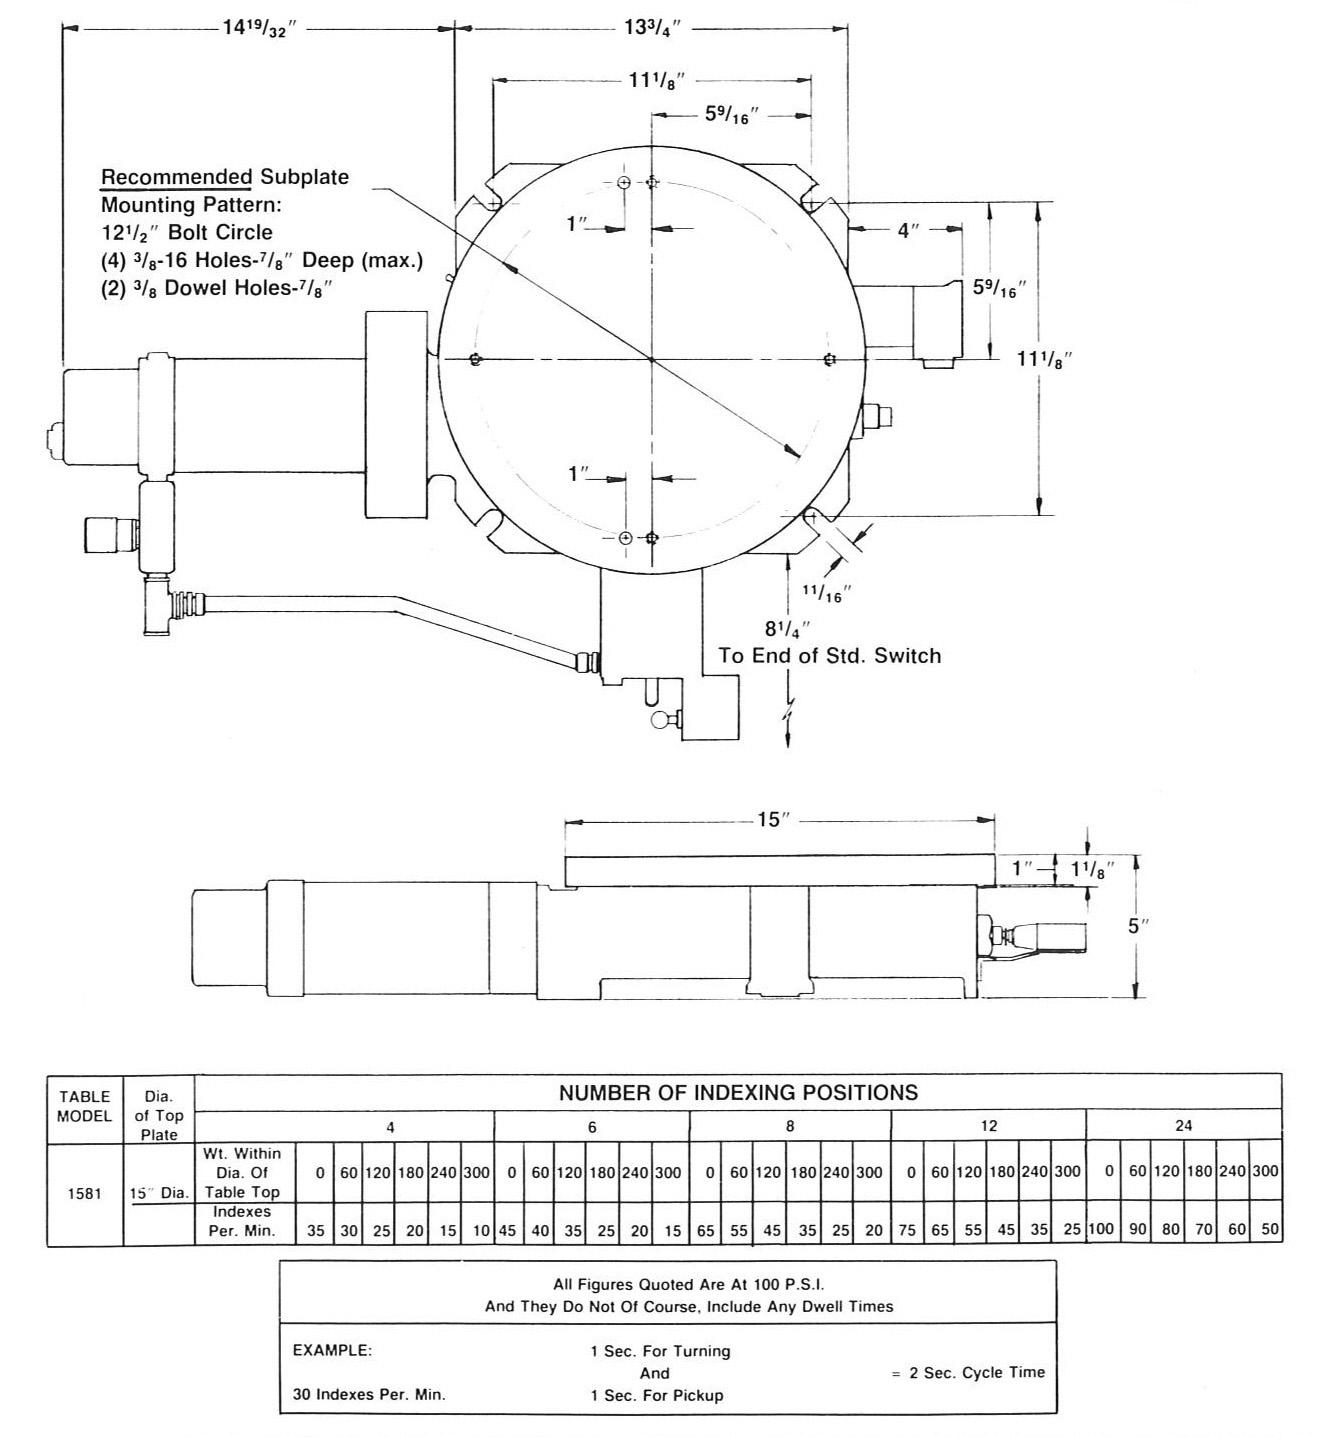 Model 1581 Dimensions